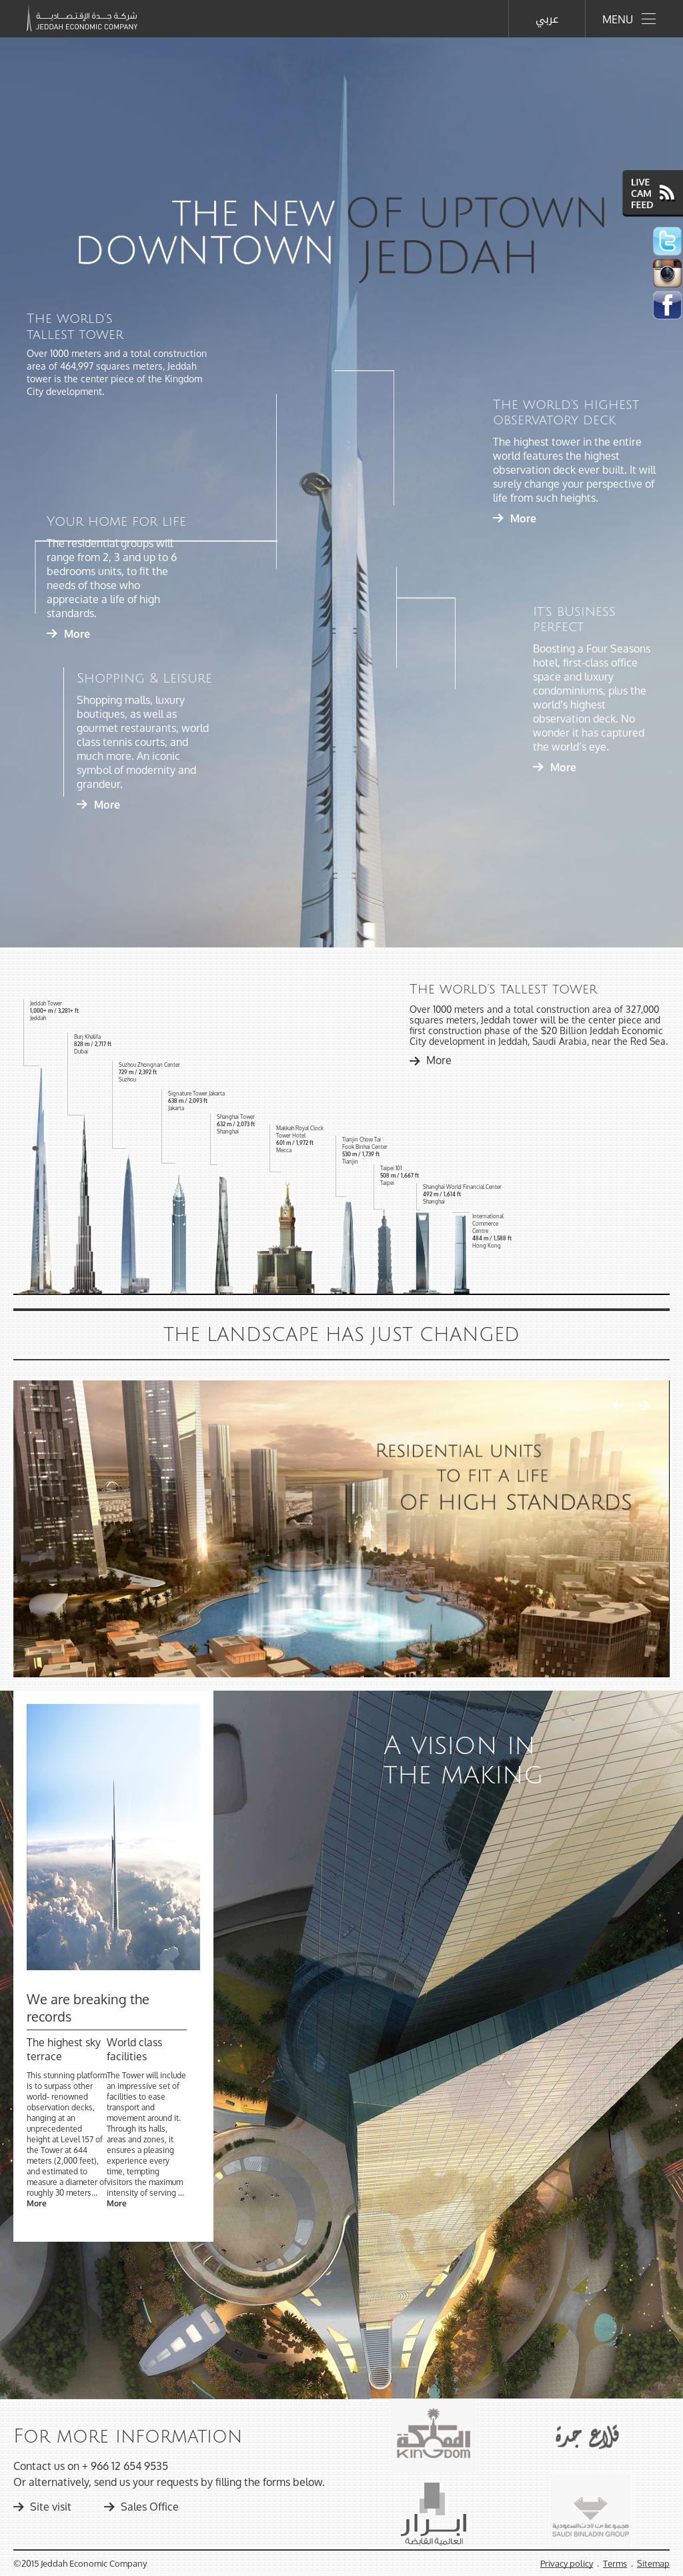 Jeddah Economic Company Competitors, Revenue and Employees